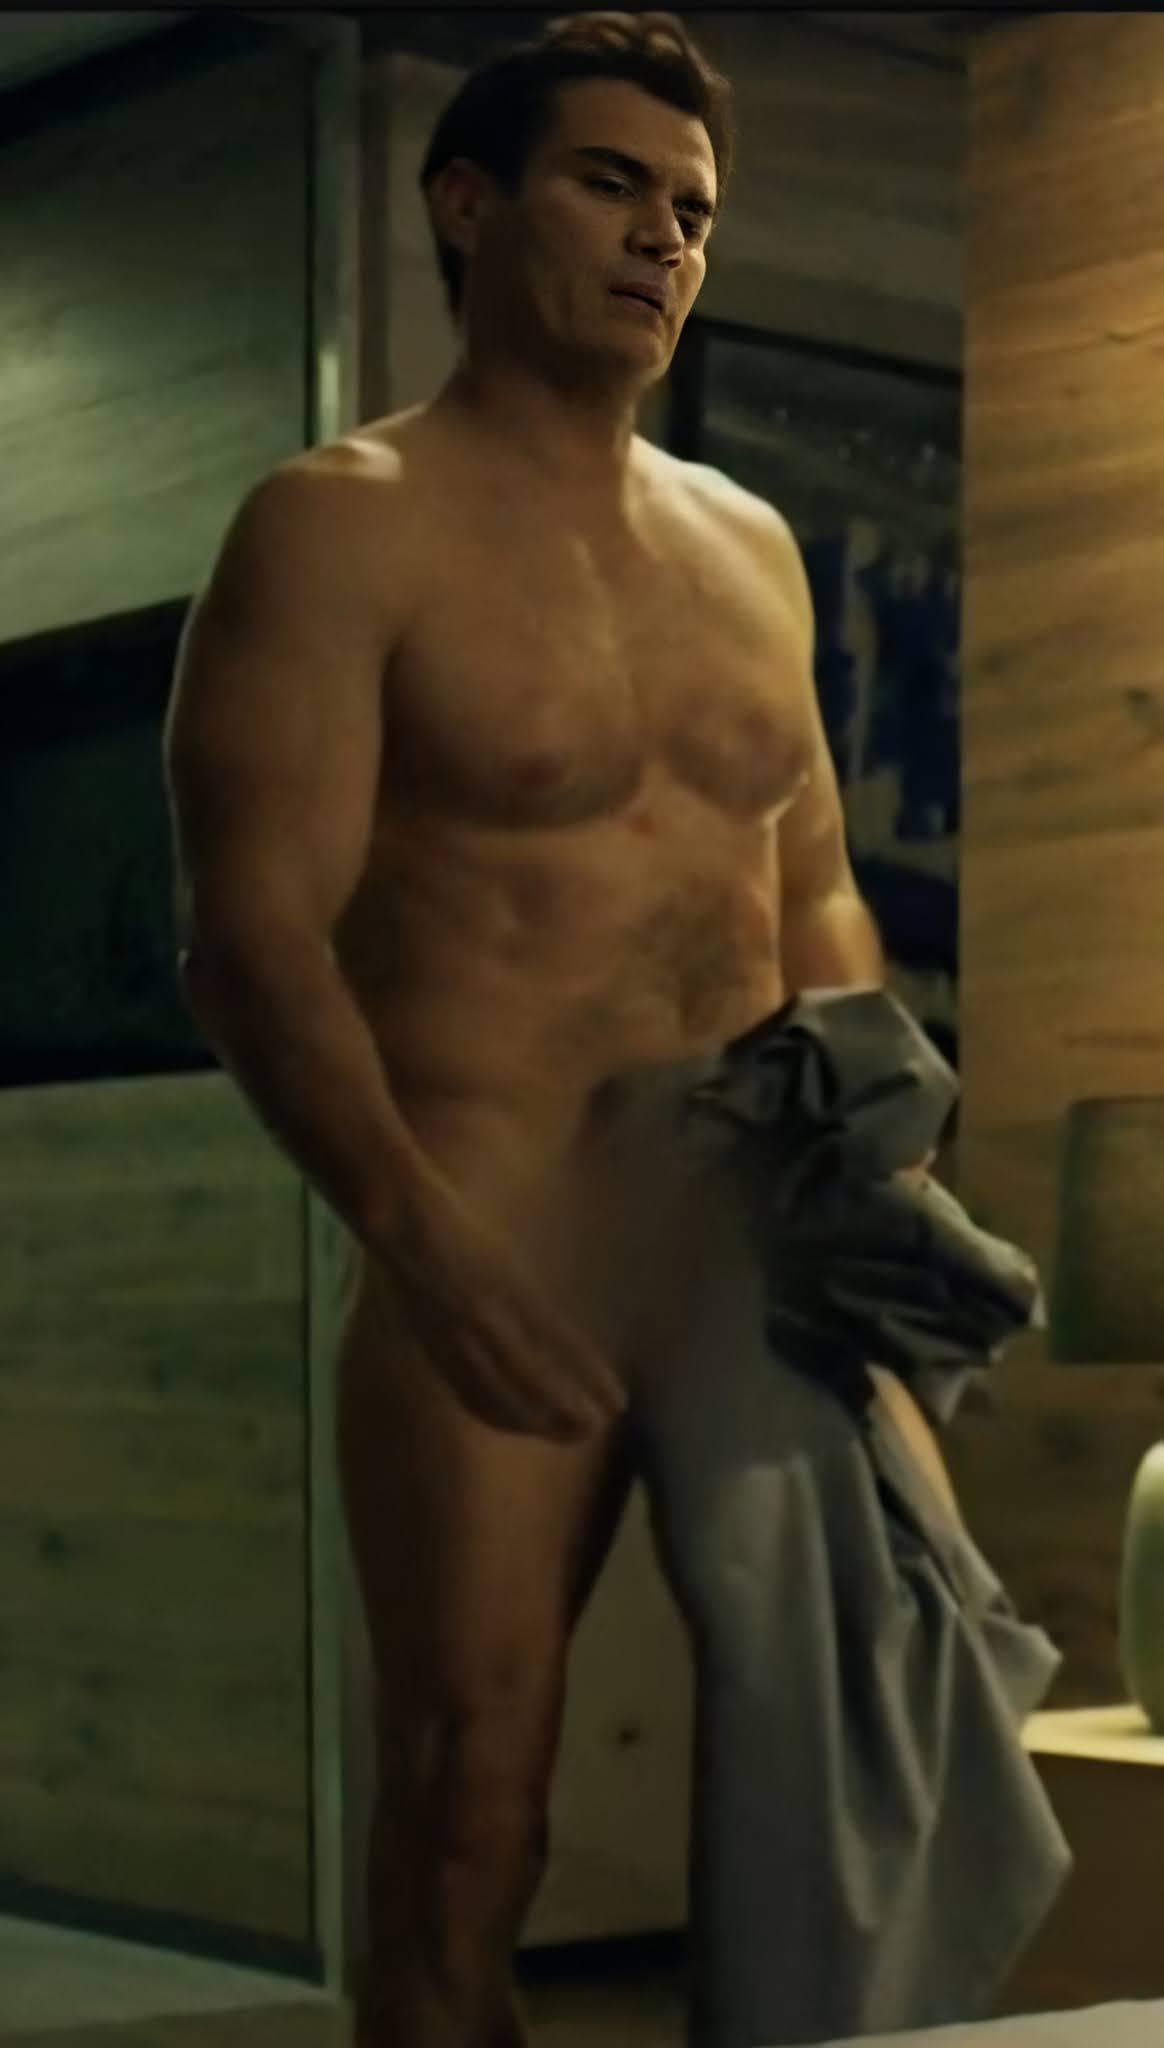 david zepeda desnudo maduro